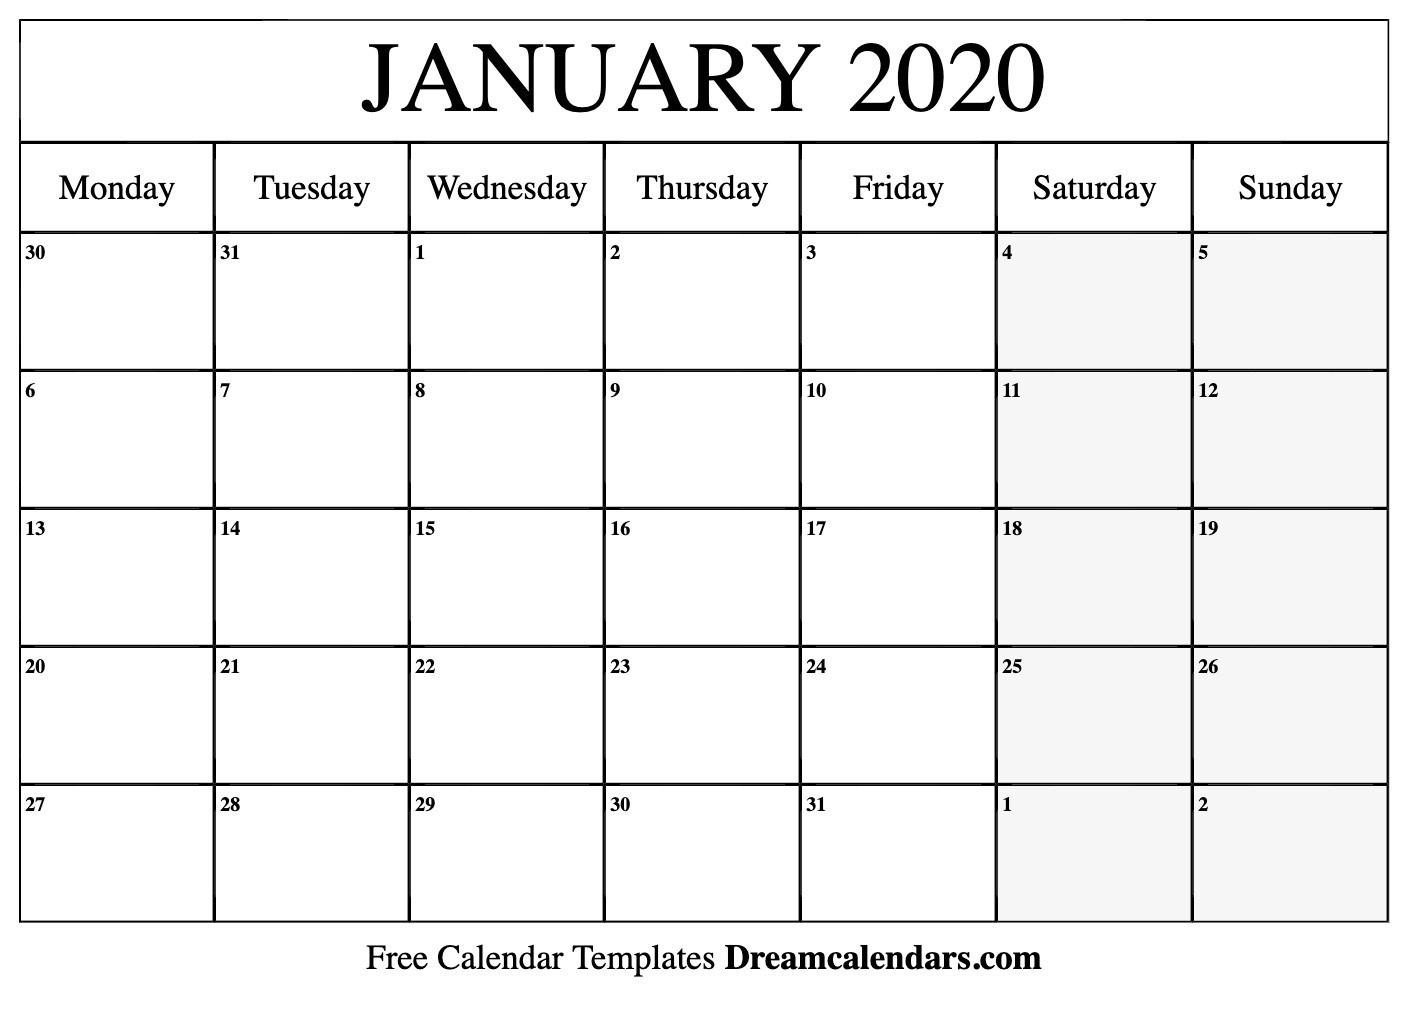 Printable January 2020 Calendar-Free Printable January 2020 Calendar